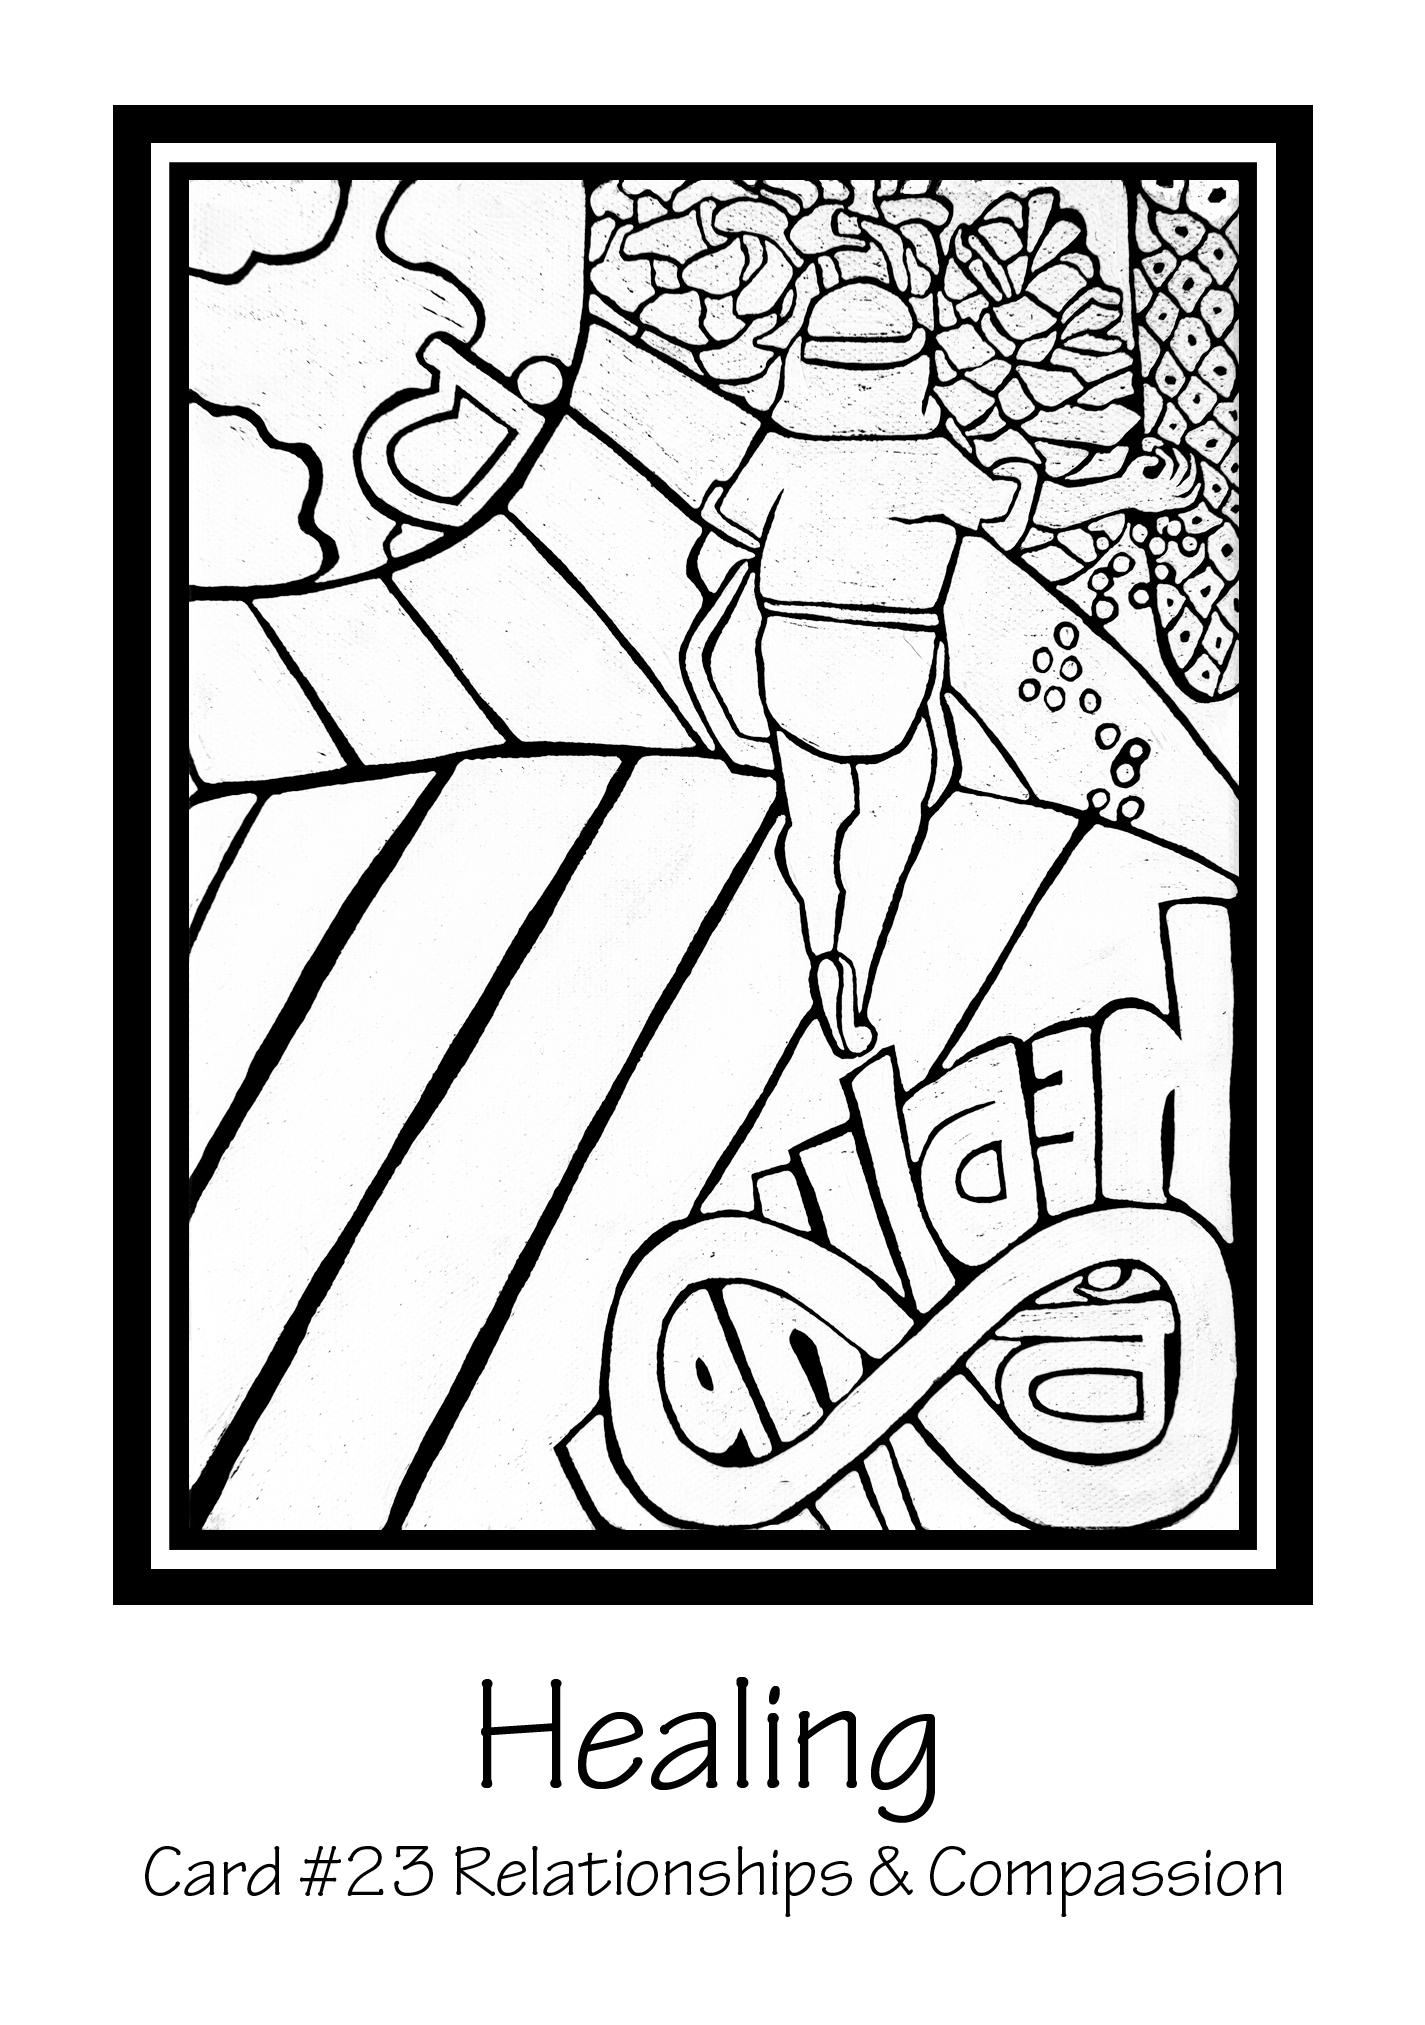 #23 Healing CB with Bleed.jpg